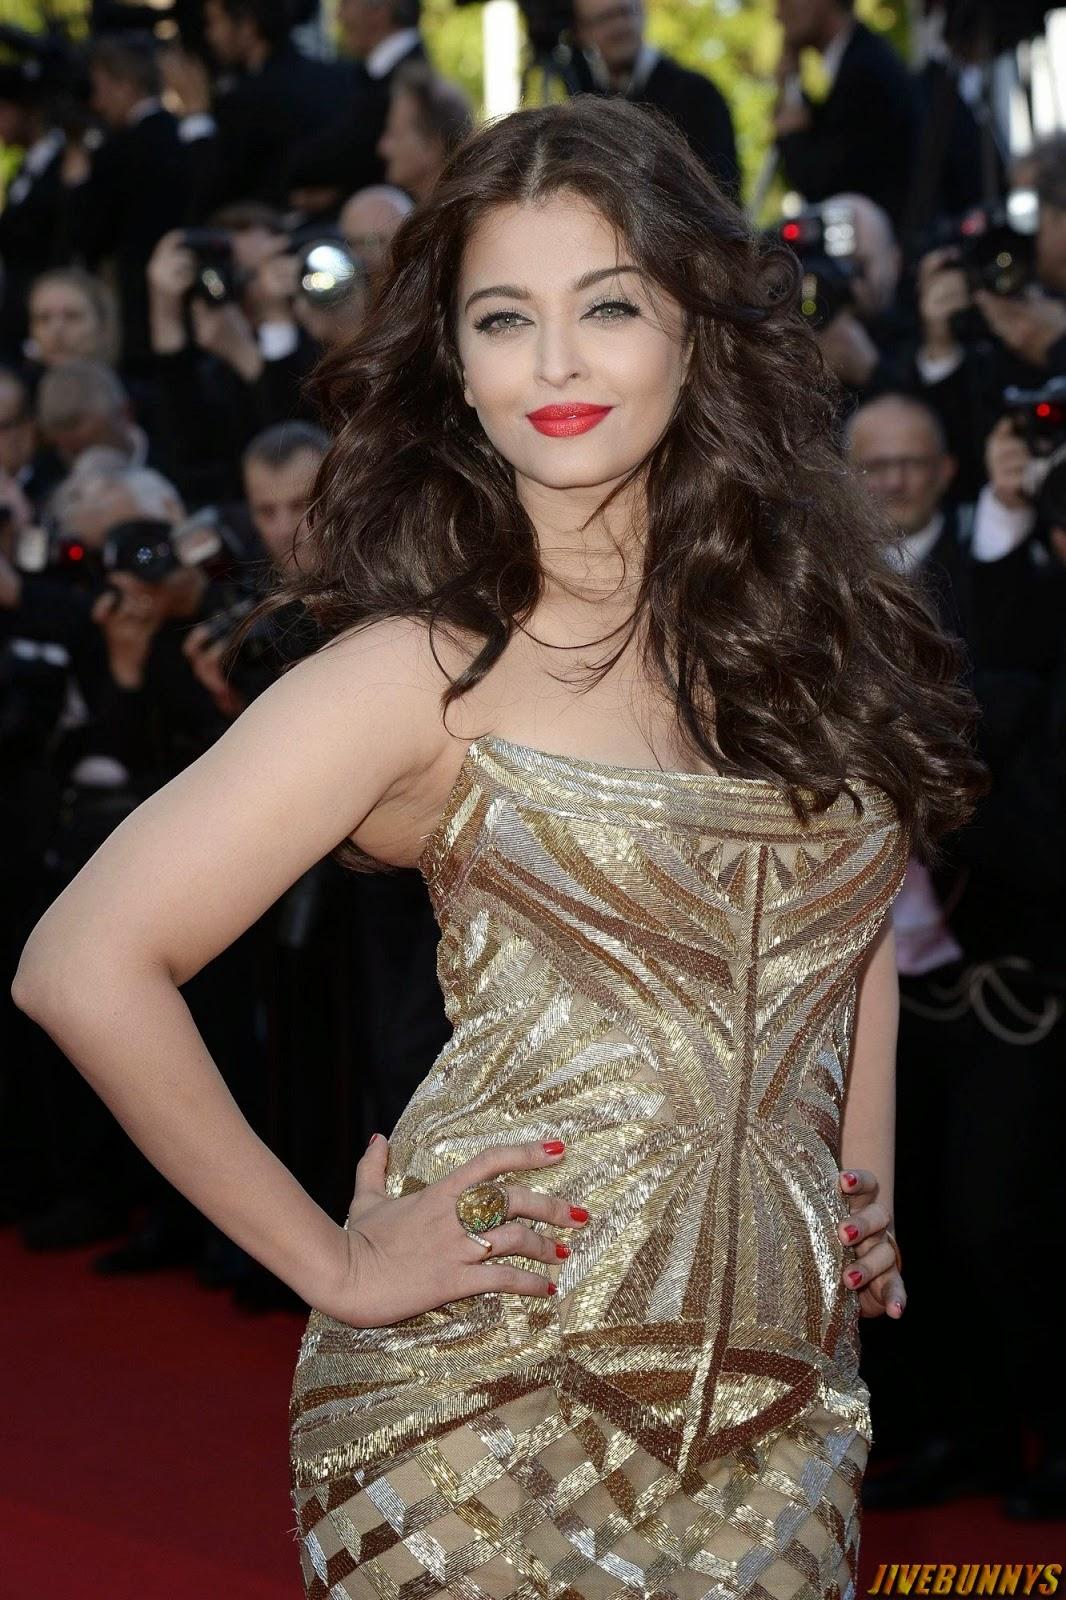 Aishwarya Rai Latest New Look Hd Hot And Sexy Photo Gallery-6783